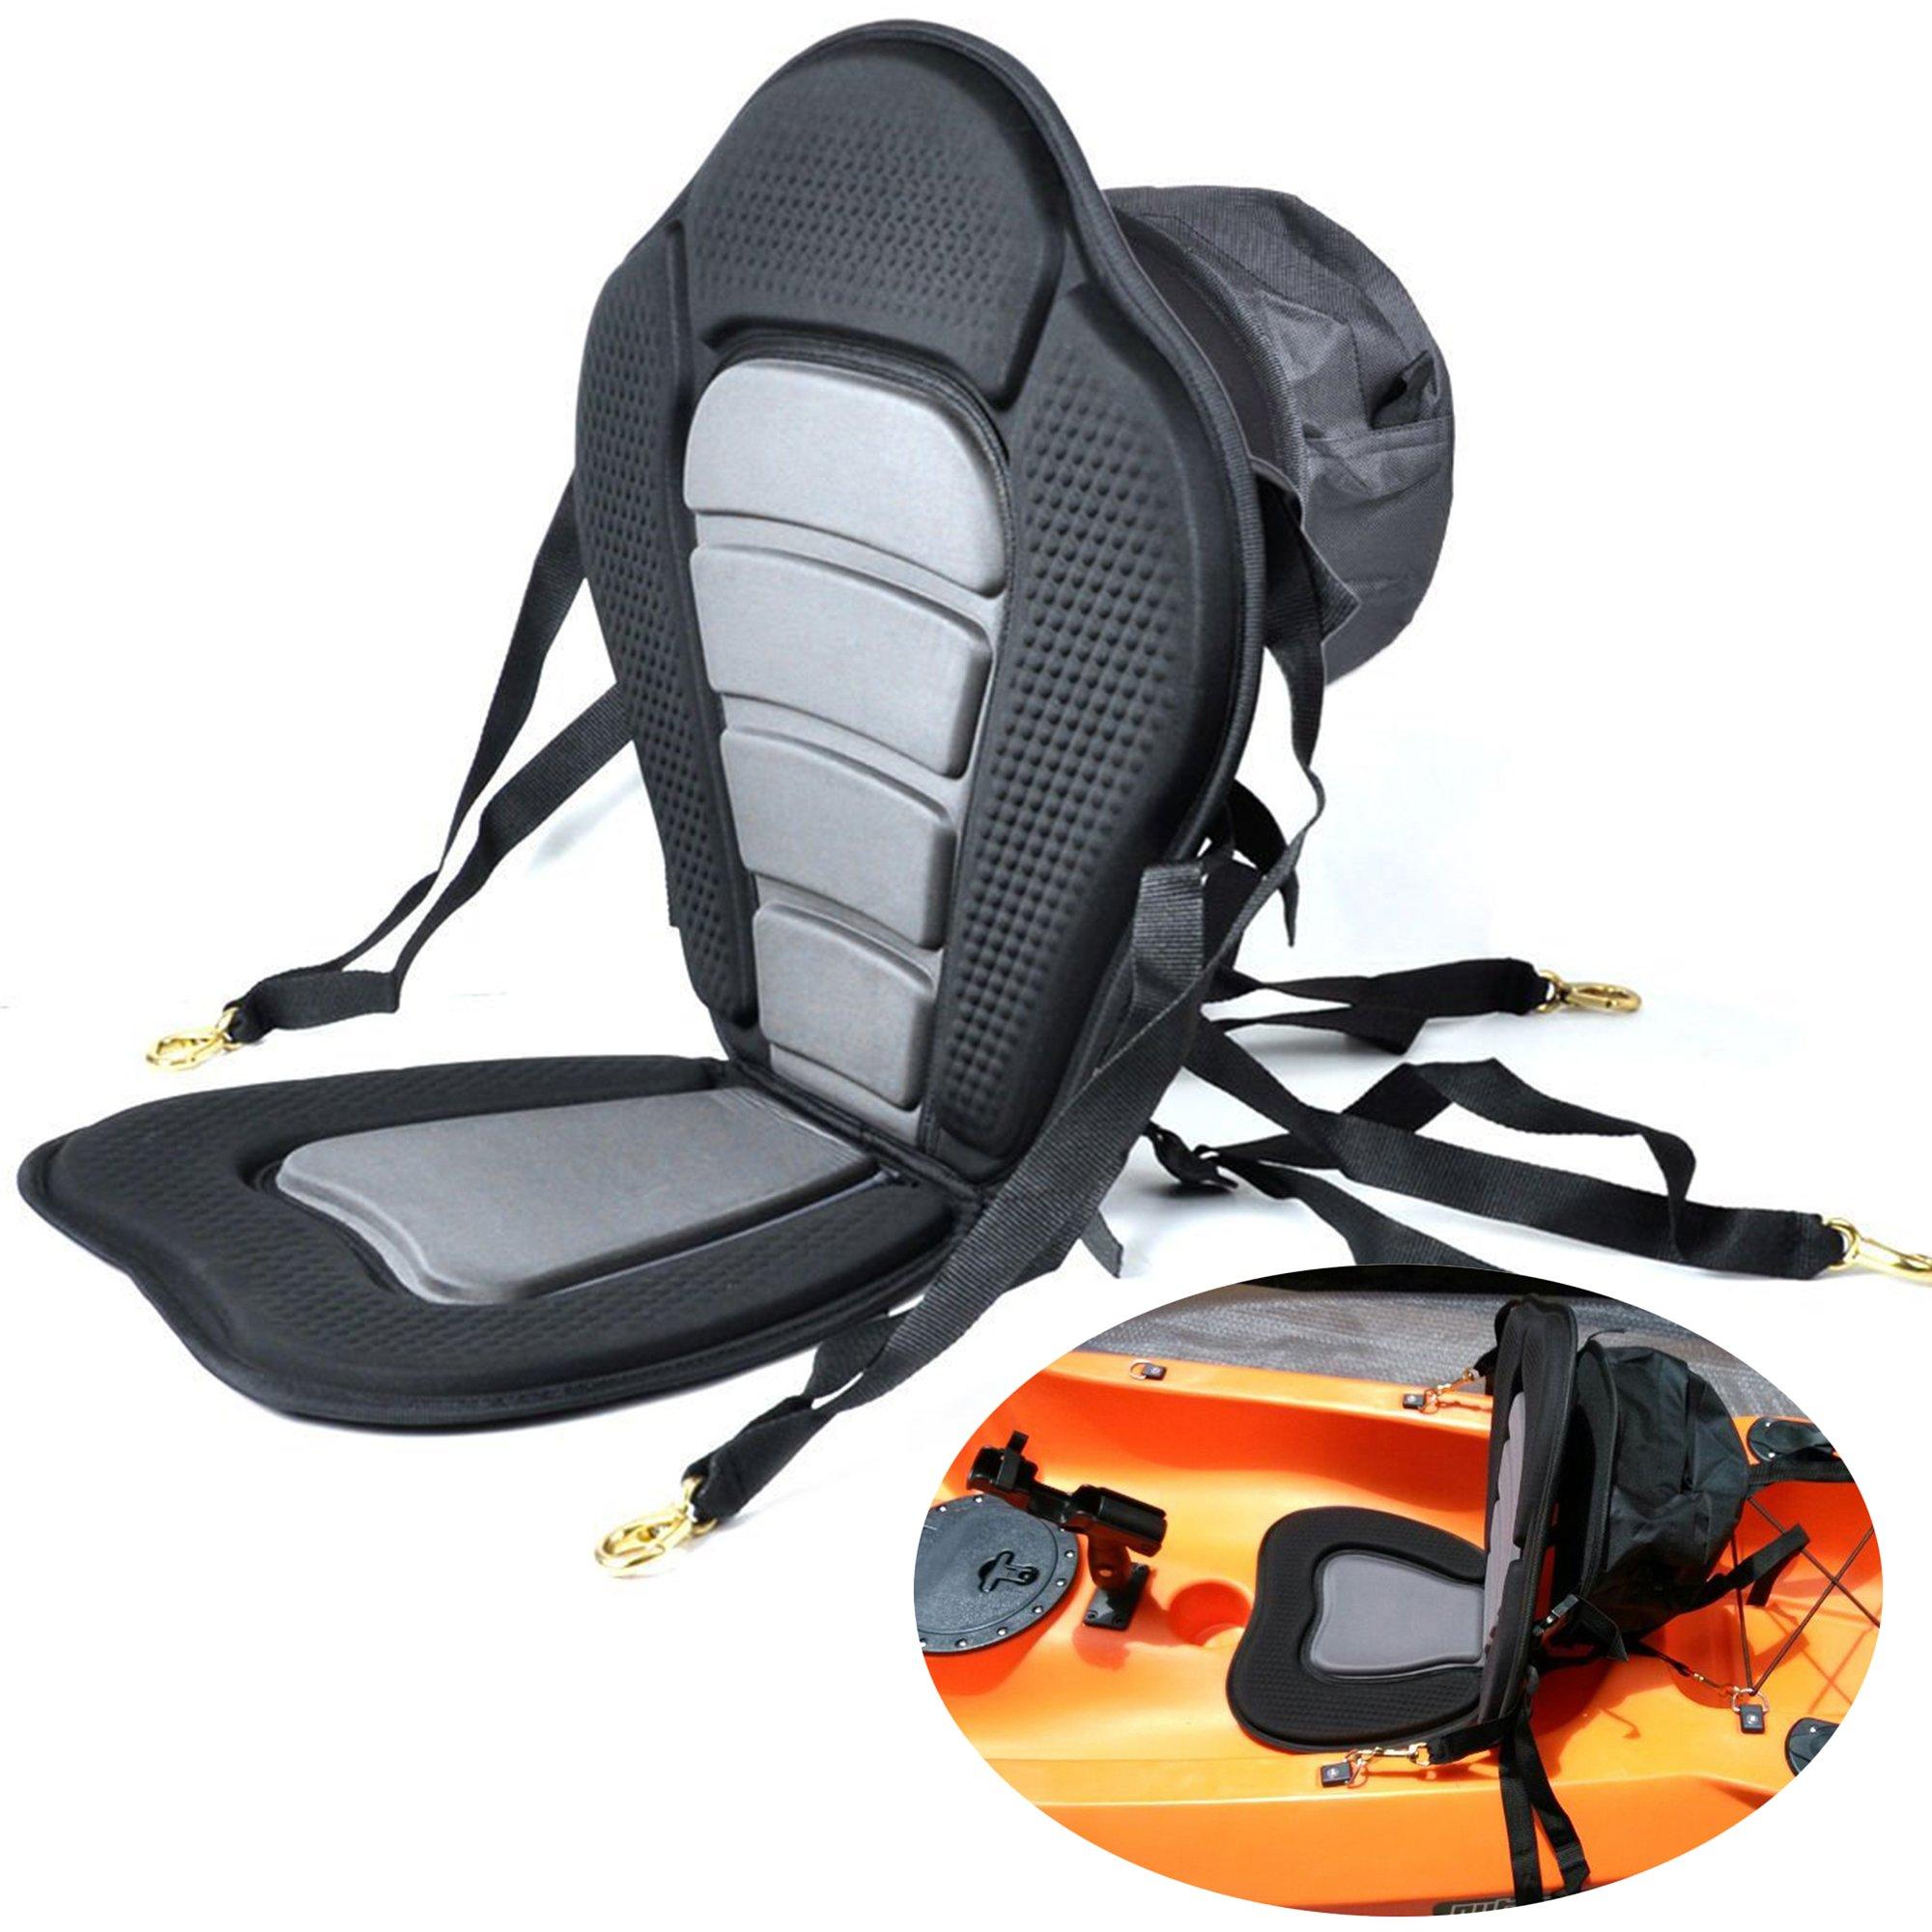 Welugnal Kayak Backrest Boating Seat,Luxury Adjustable Padded Kayak Seat Back with Detachable Canoe Backrest Seat Bag by Welugnal